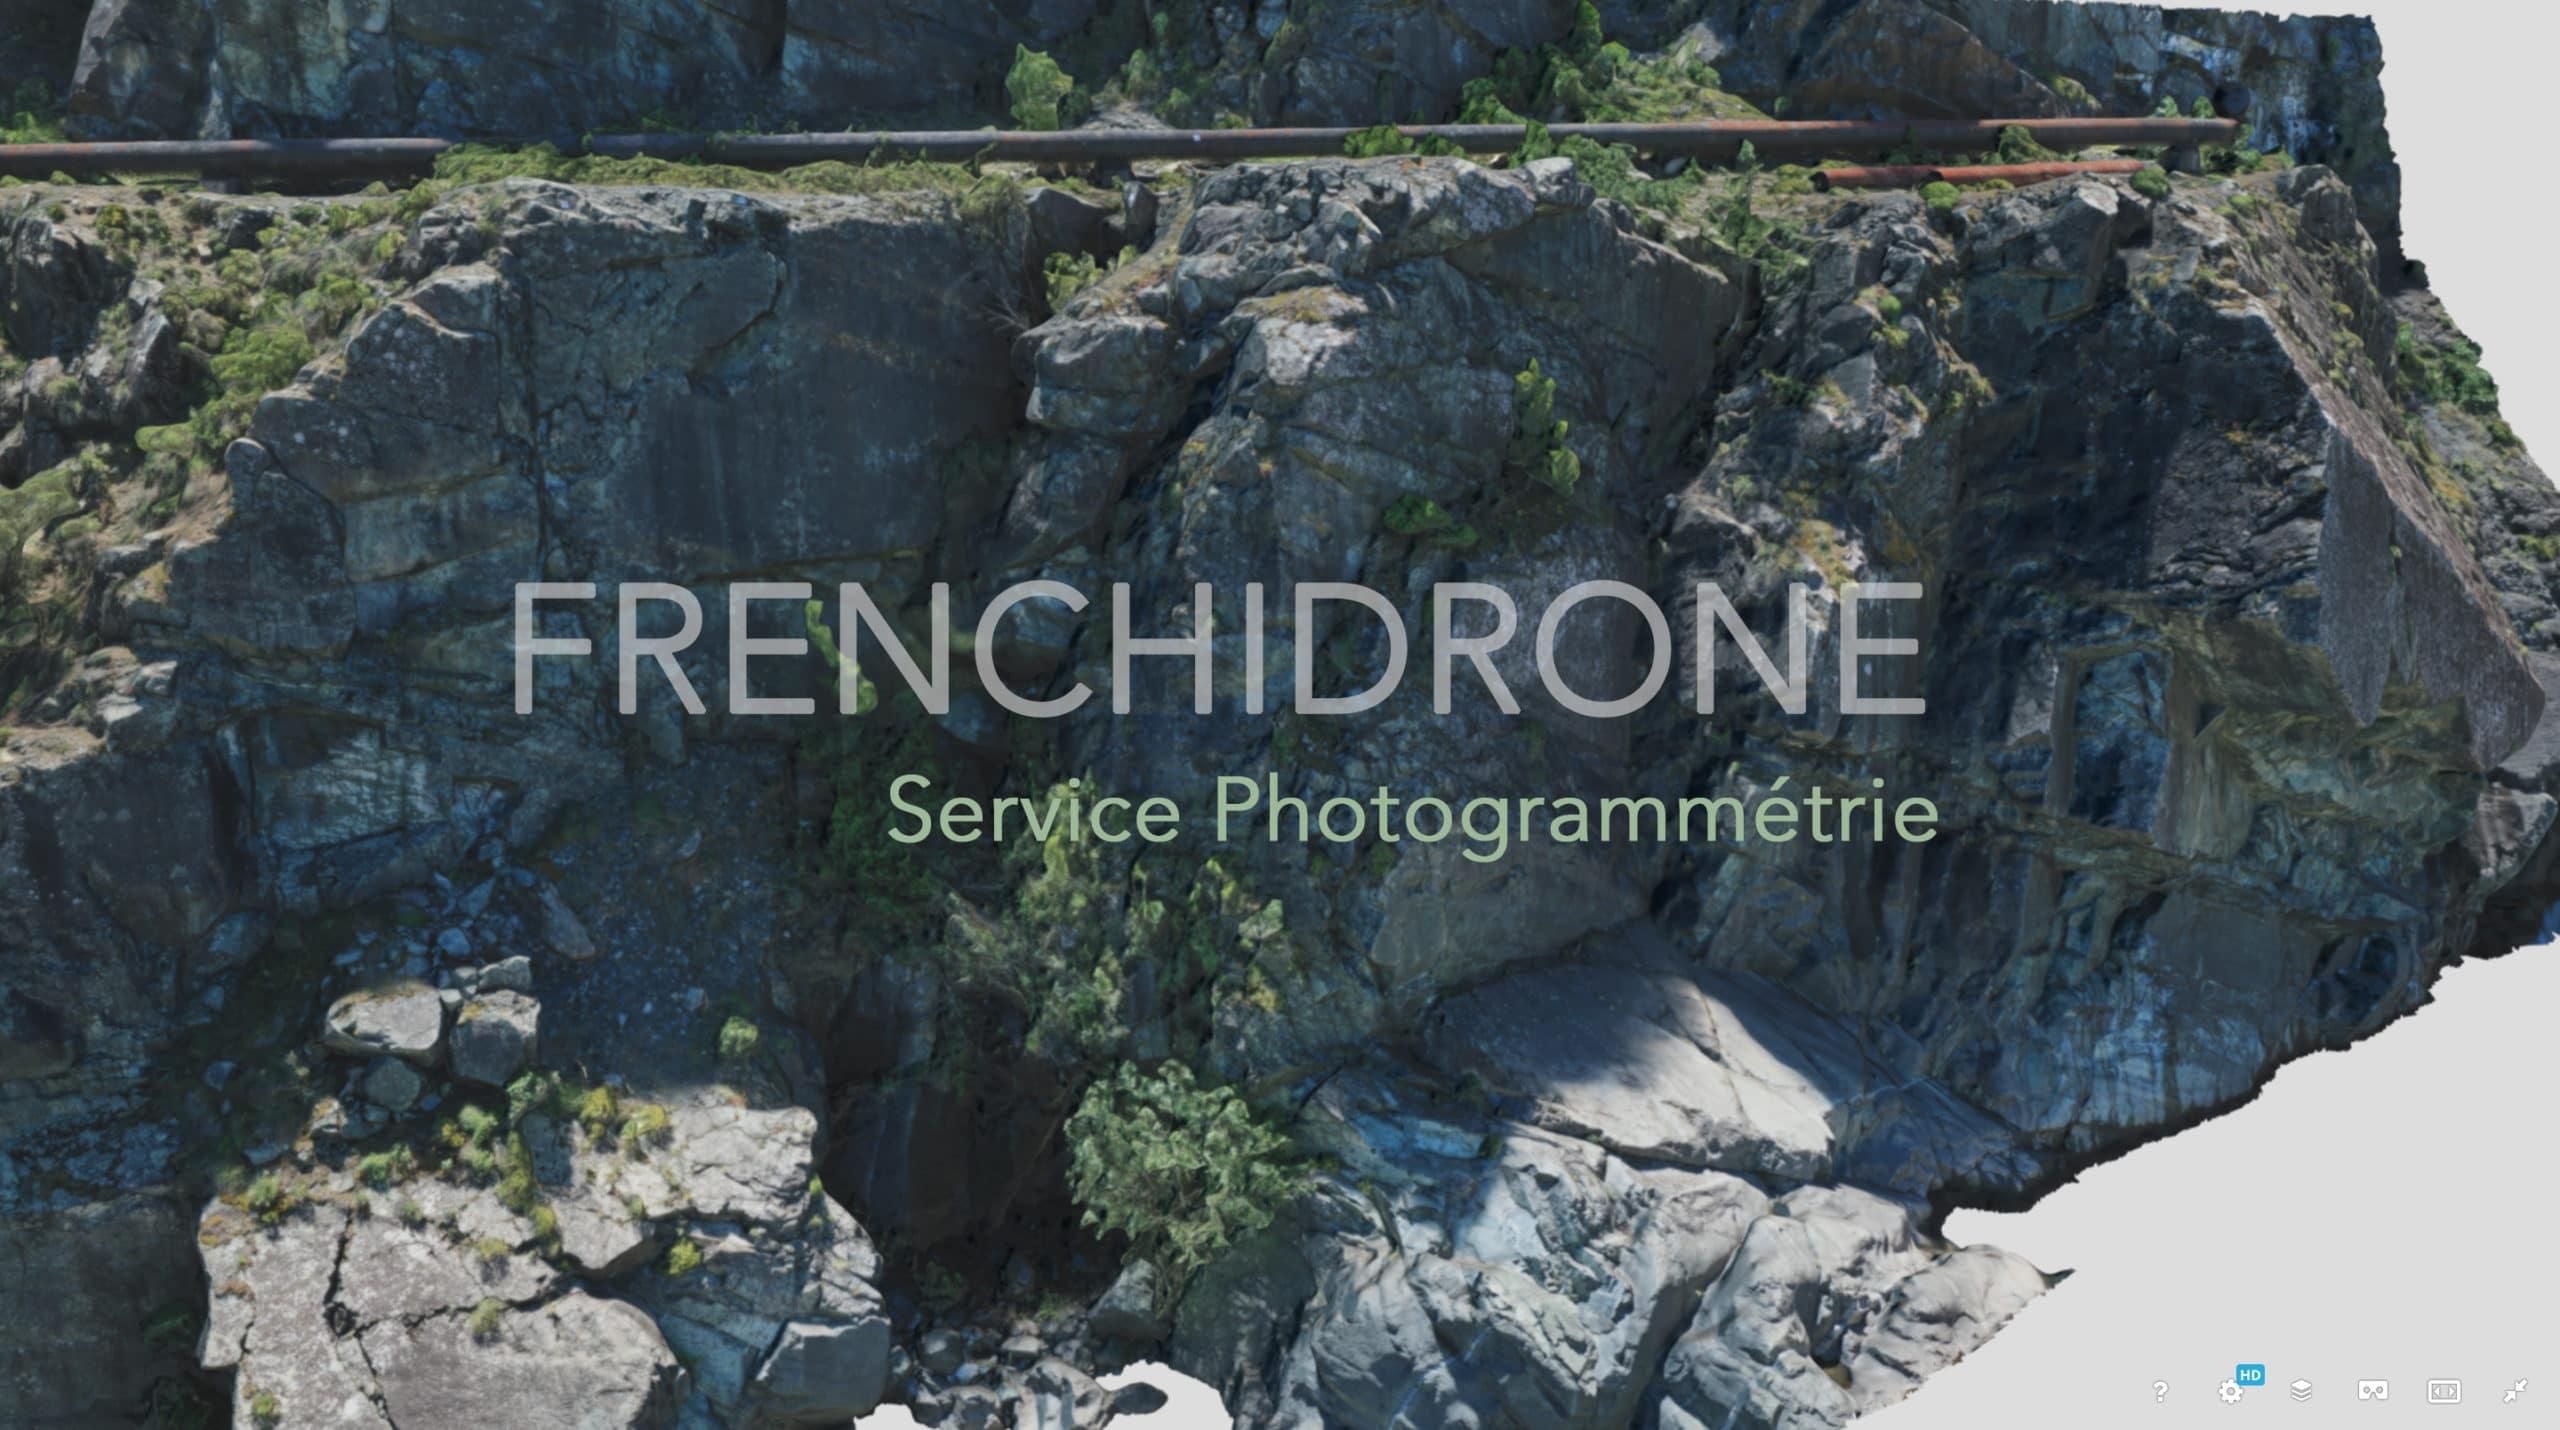 Frenchidrone-photogrammétrie-service-scaled